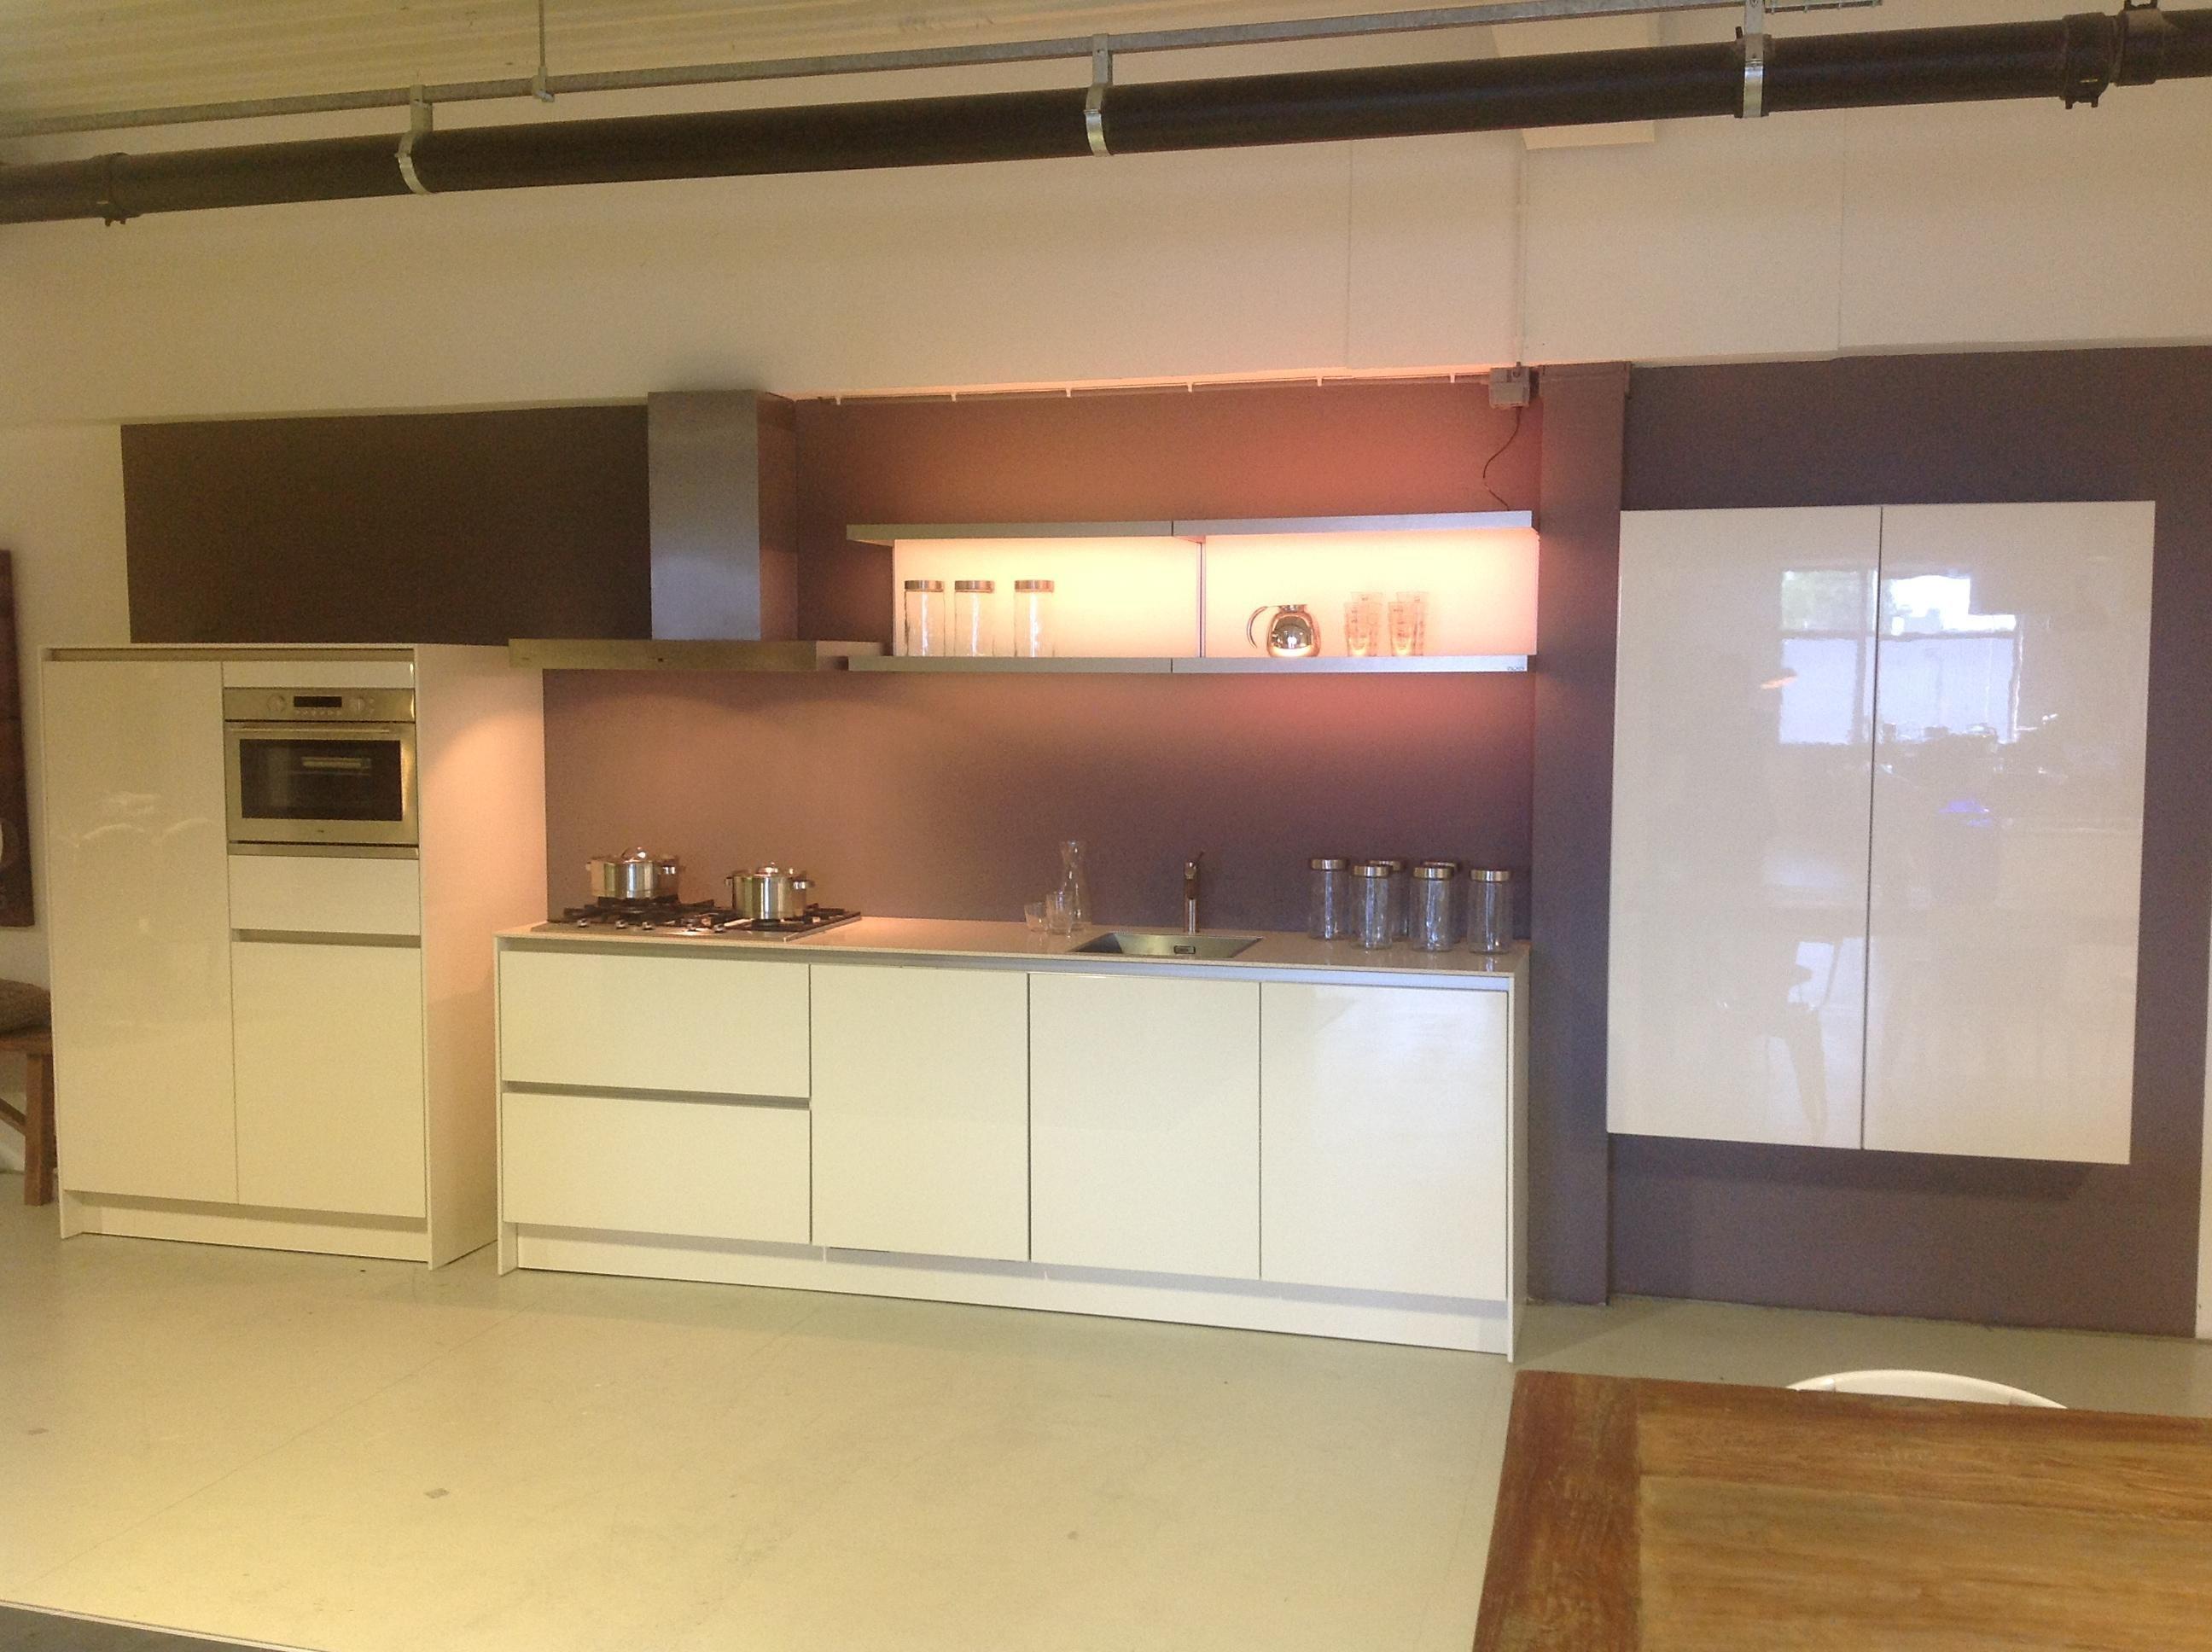 Moderne Greeploze Rechte Keuken: By tieleman in bleiswijk model ...